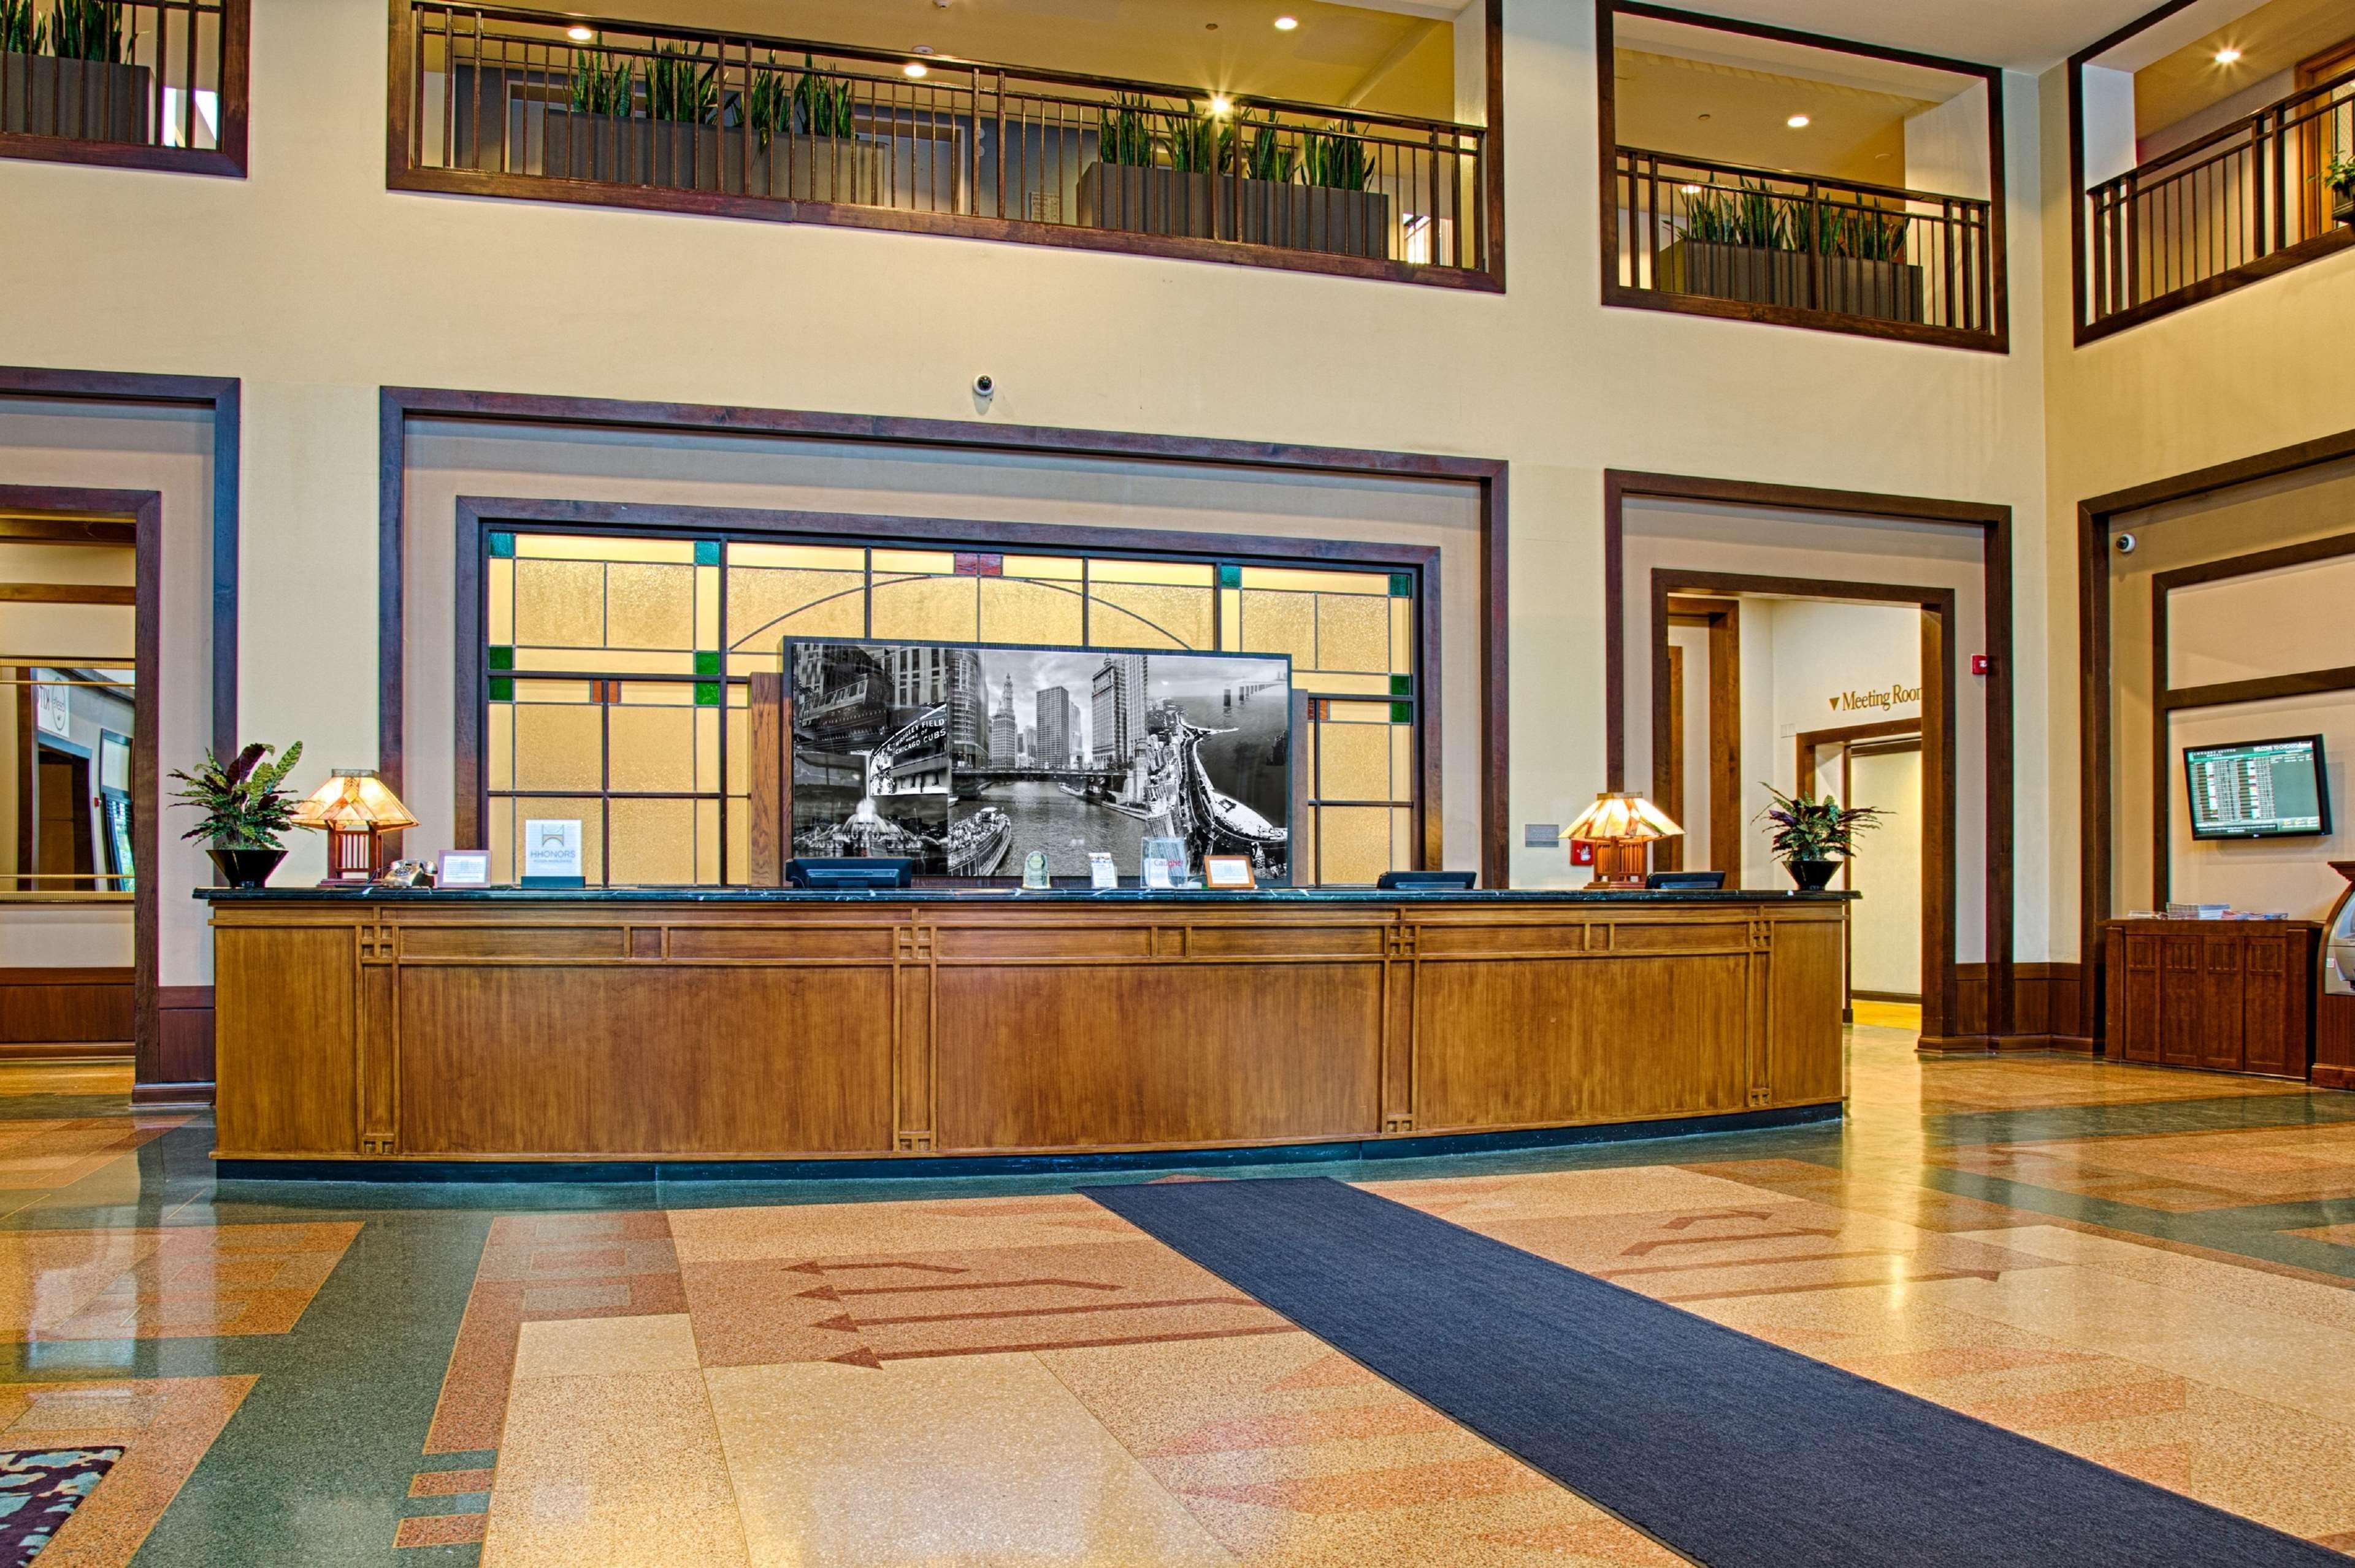 Basil S Kitchen Embassy Suites Rosemont